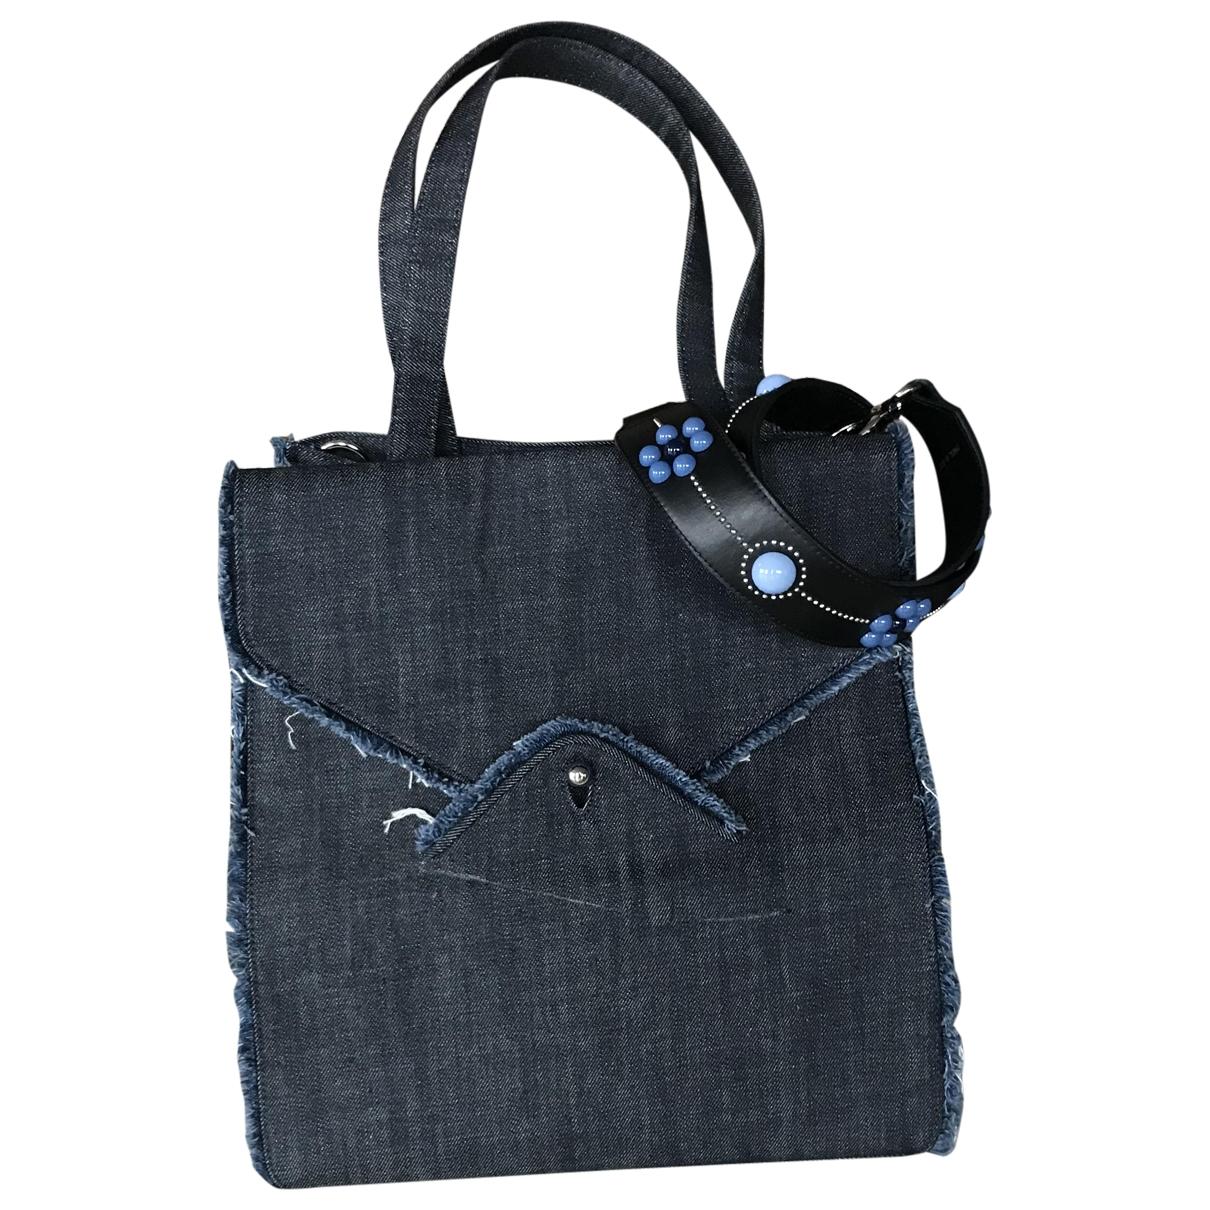 Paul & Joe \N Blue Denim - Jeans handbag for Women \N